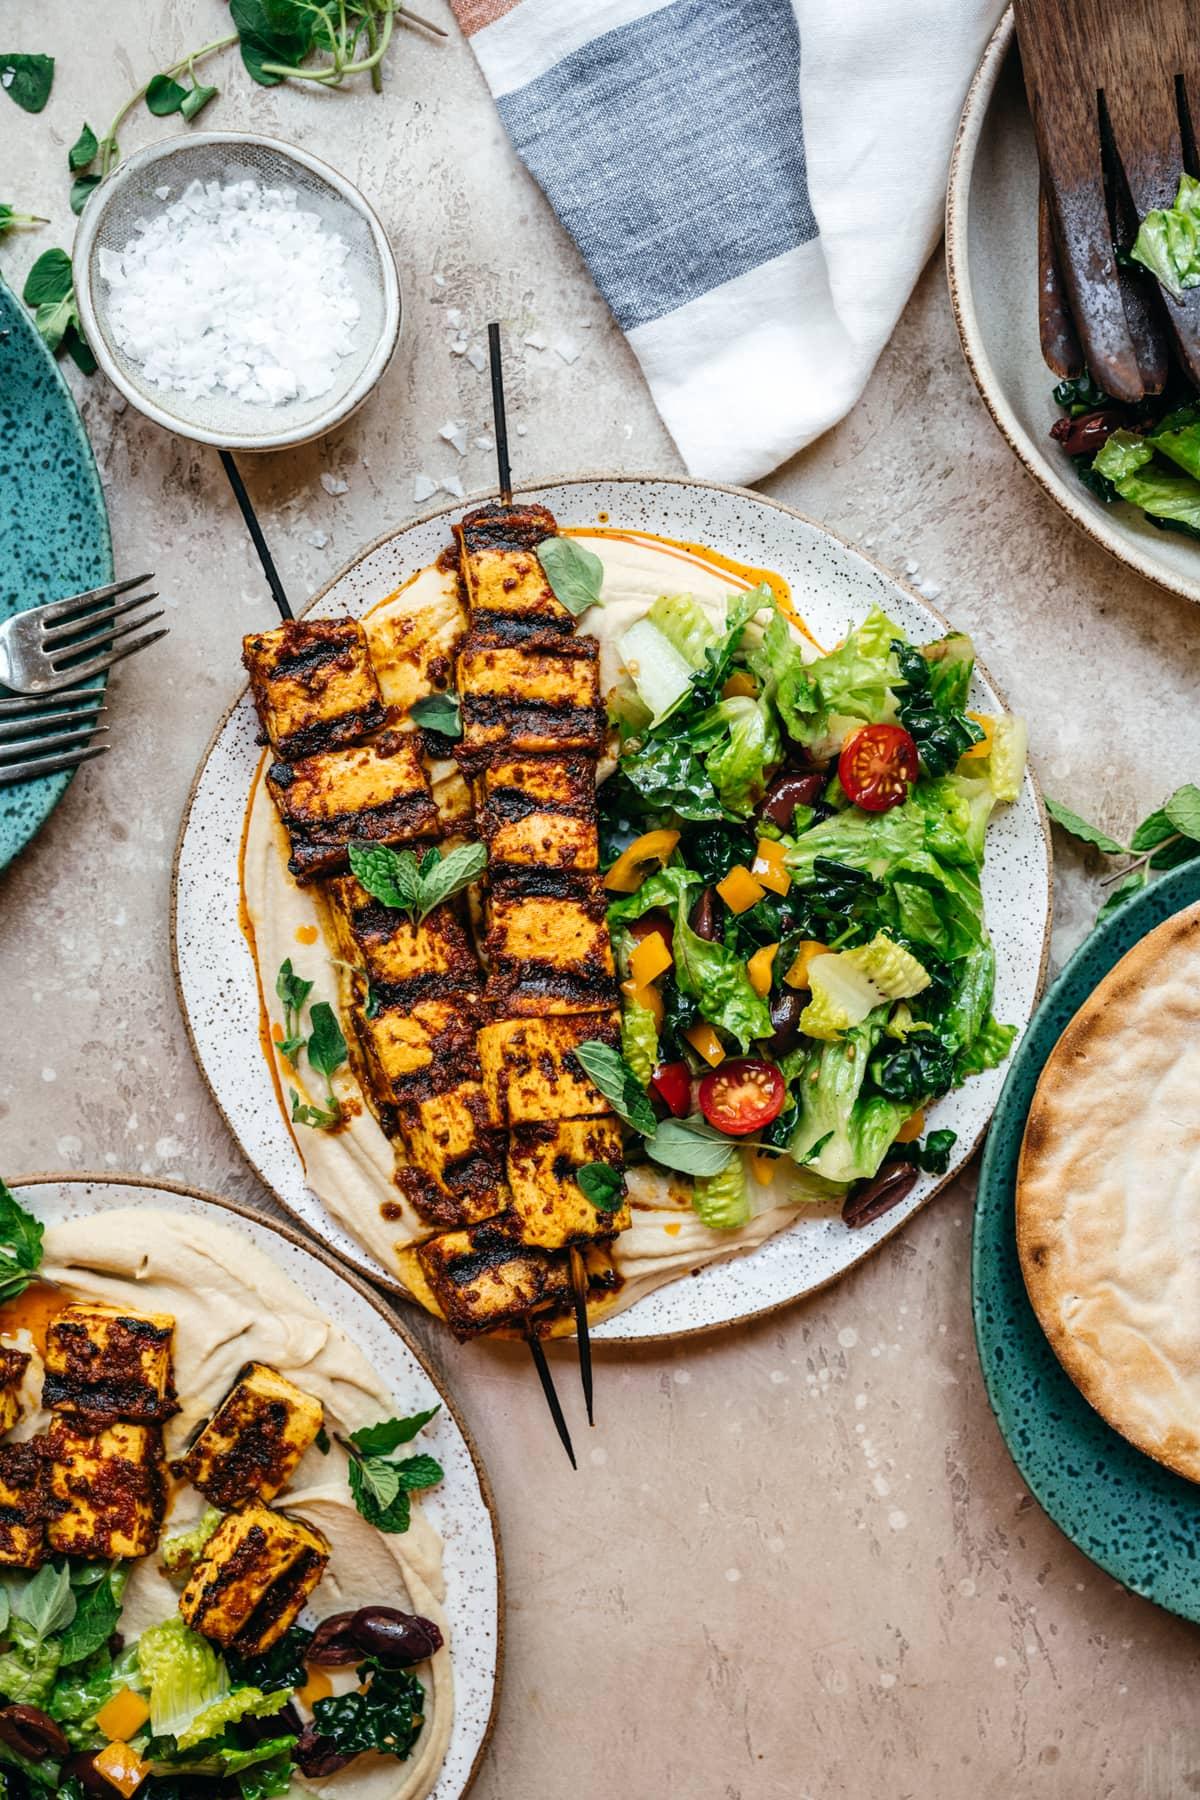 Mediterranean tofu kebabs over hummus with a salad